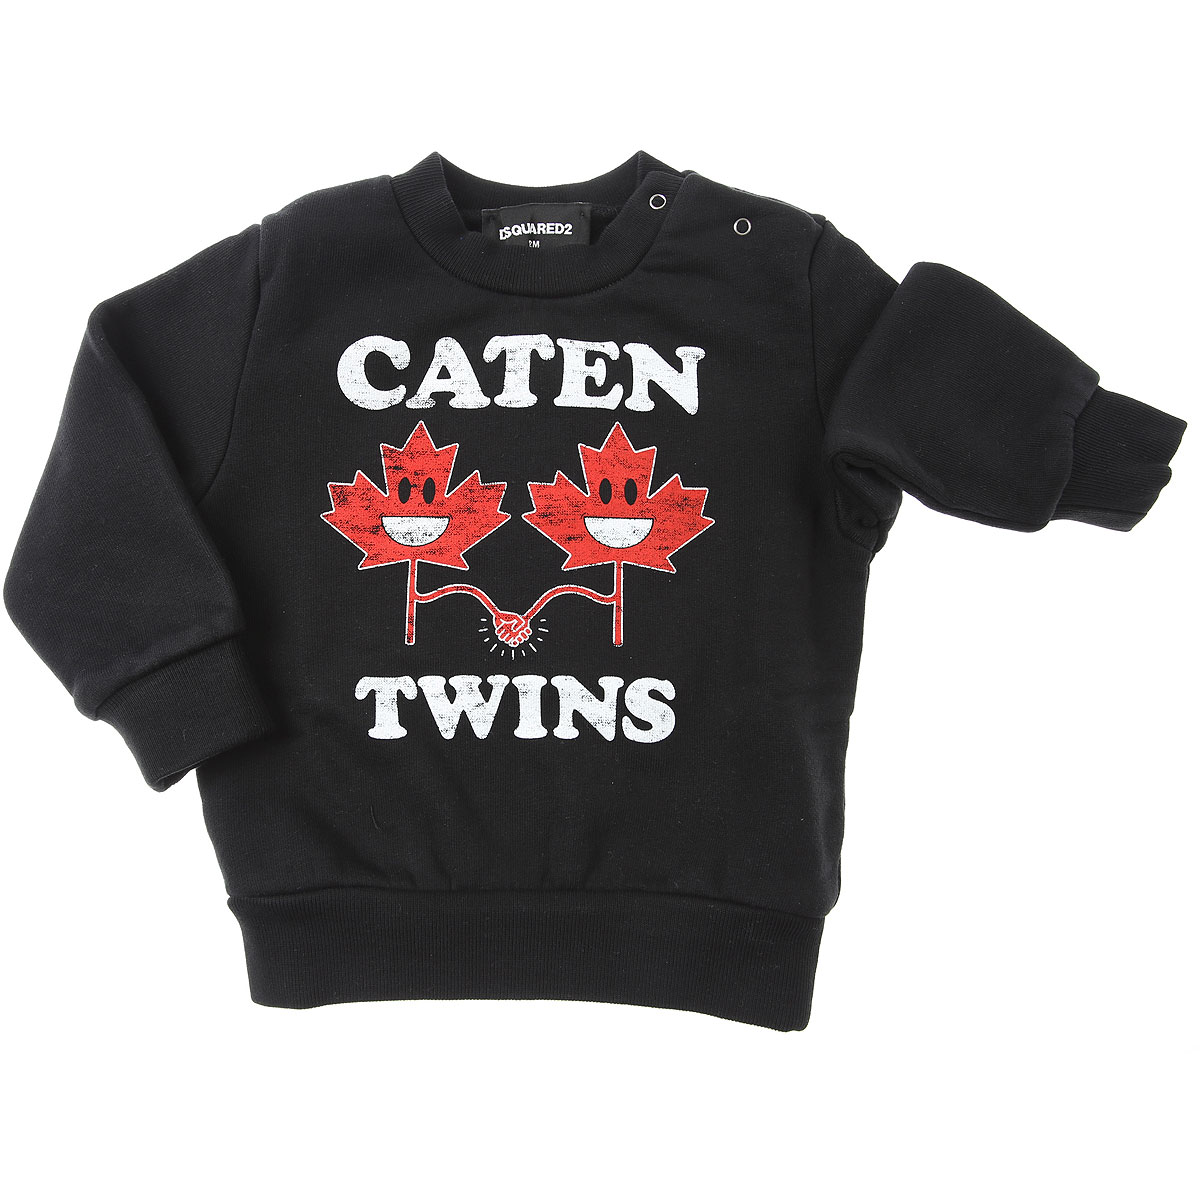 Dsquared2 Baby Sweatshirts & Hoodies for Boys On Sale, Black, Cotton, 2019, 12 M 18M